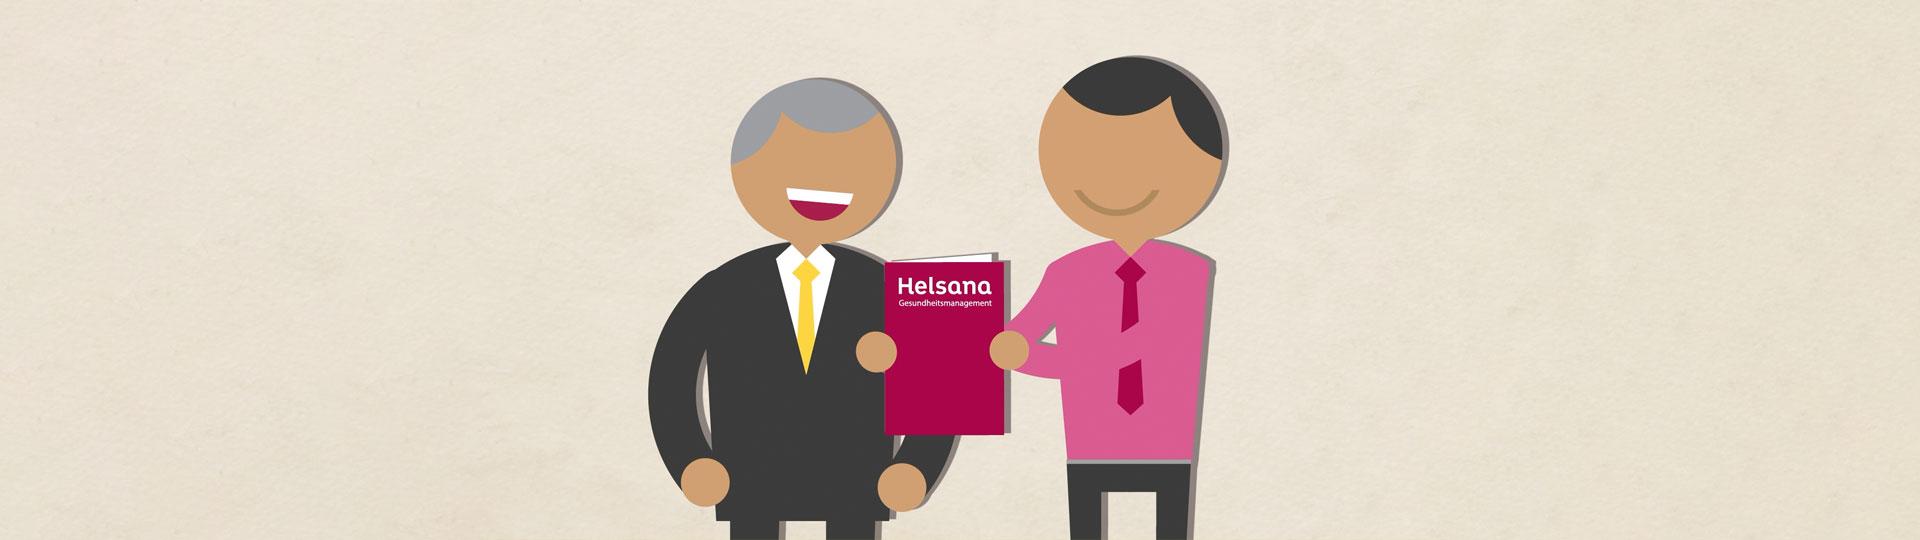 Blog-Helsana-schmal